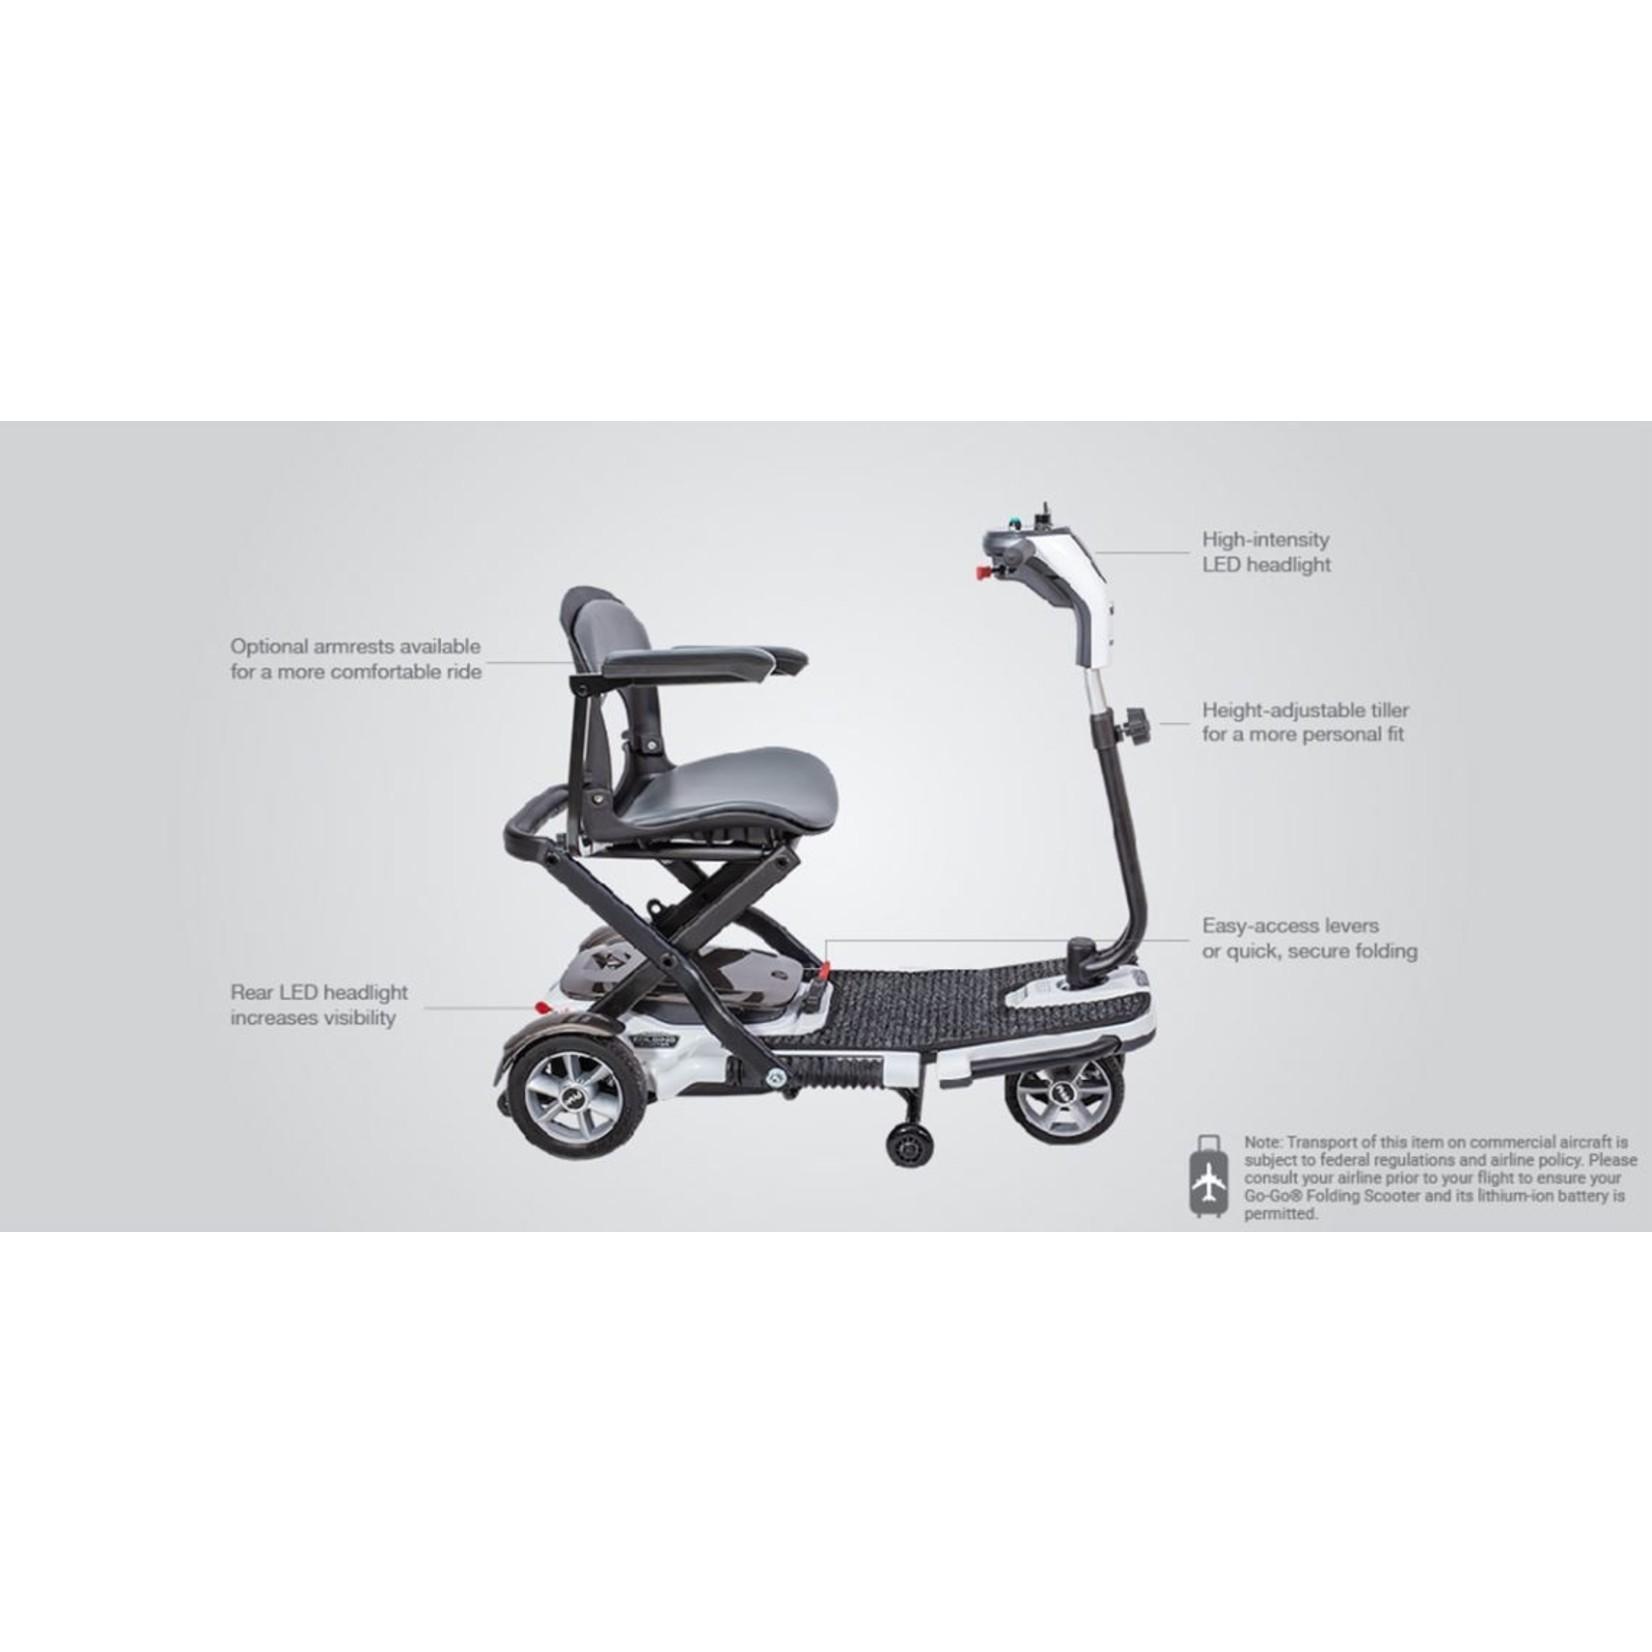 Pride Go-Go Folding 4-Wheel Scooter - Lithium